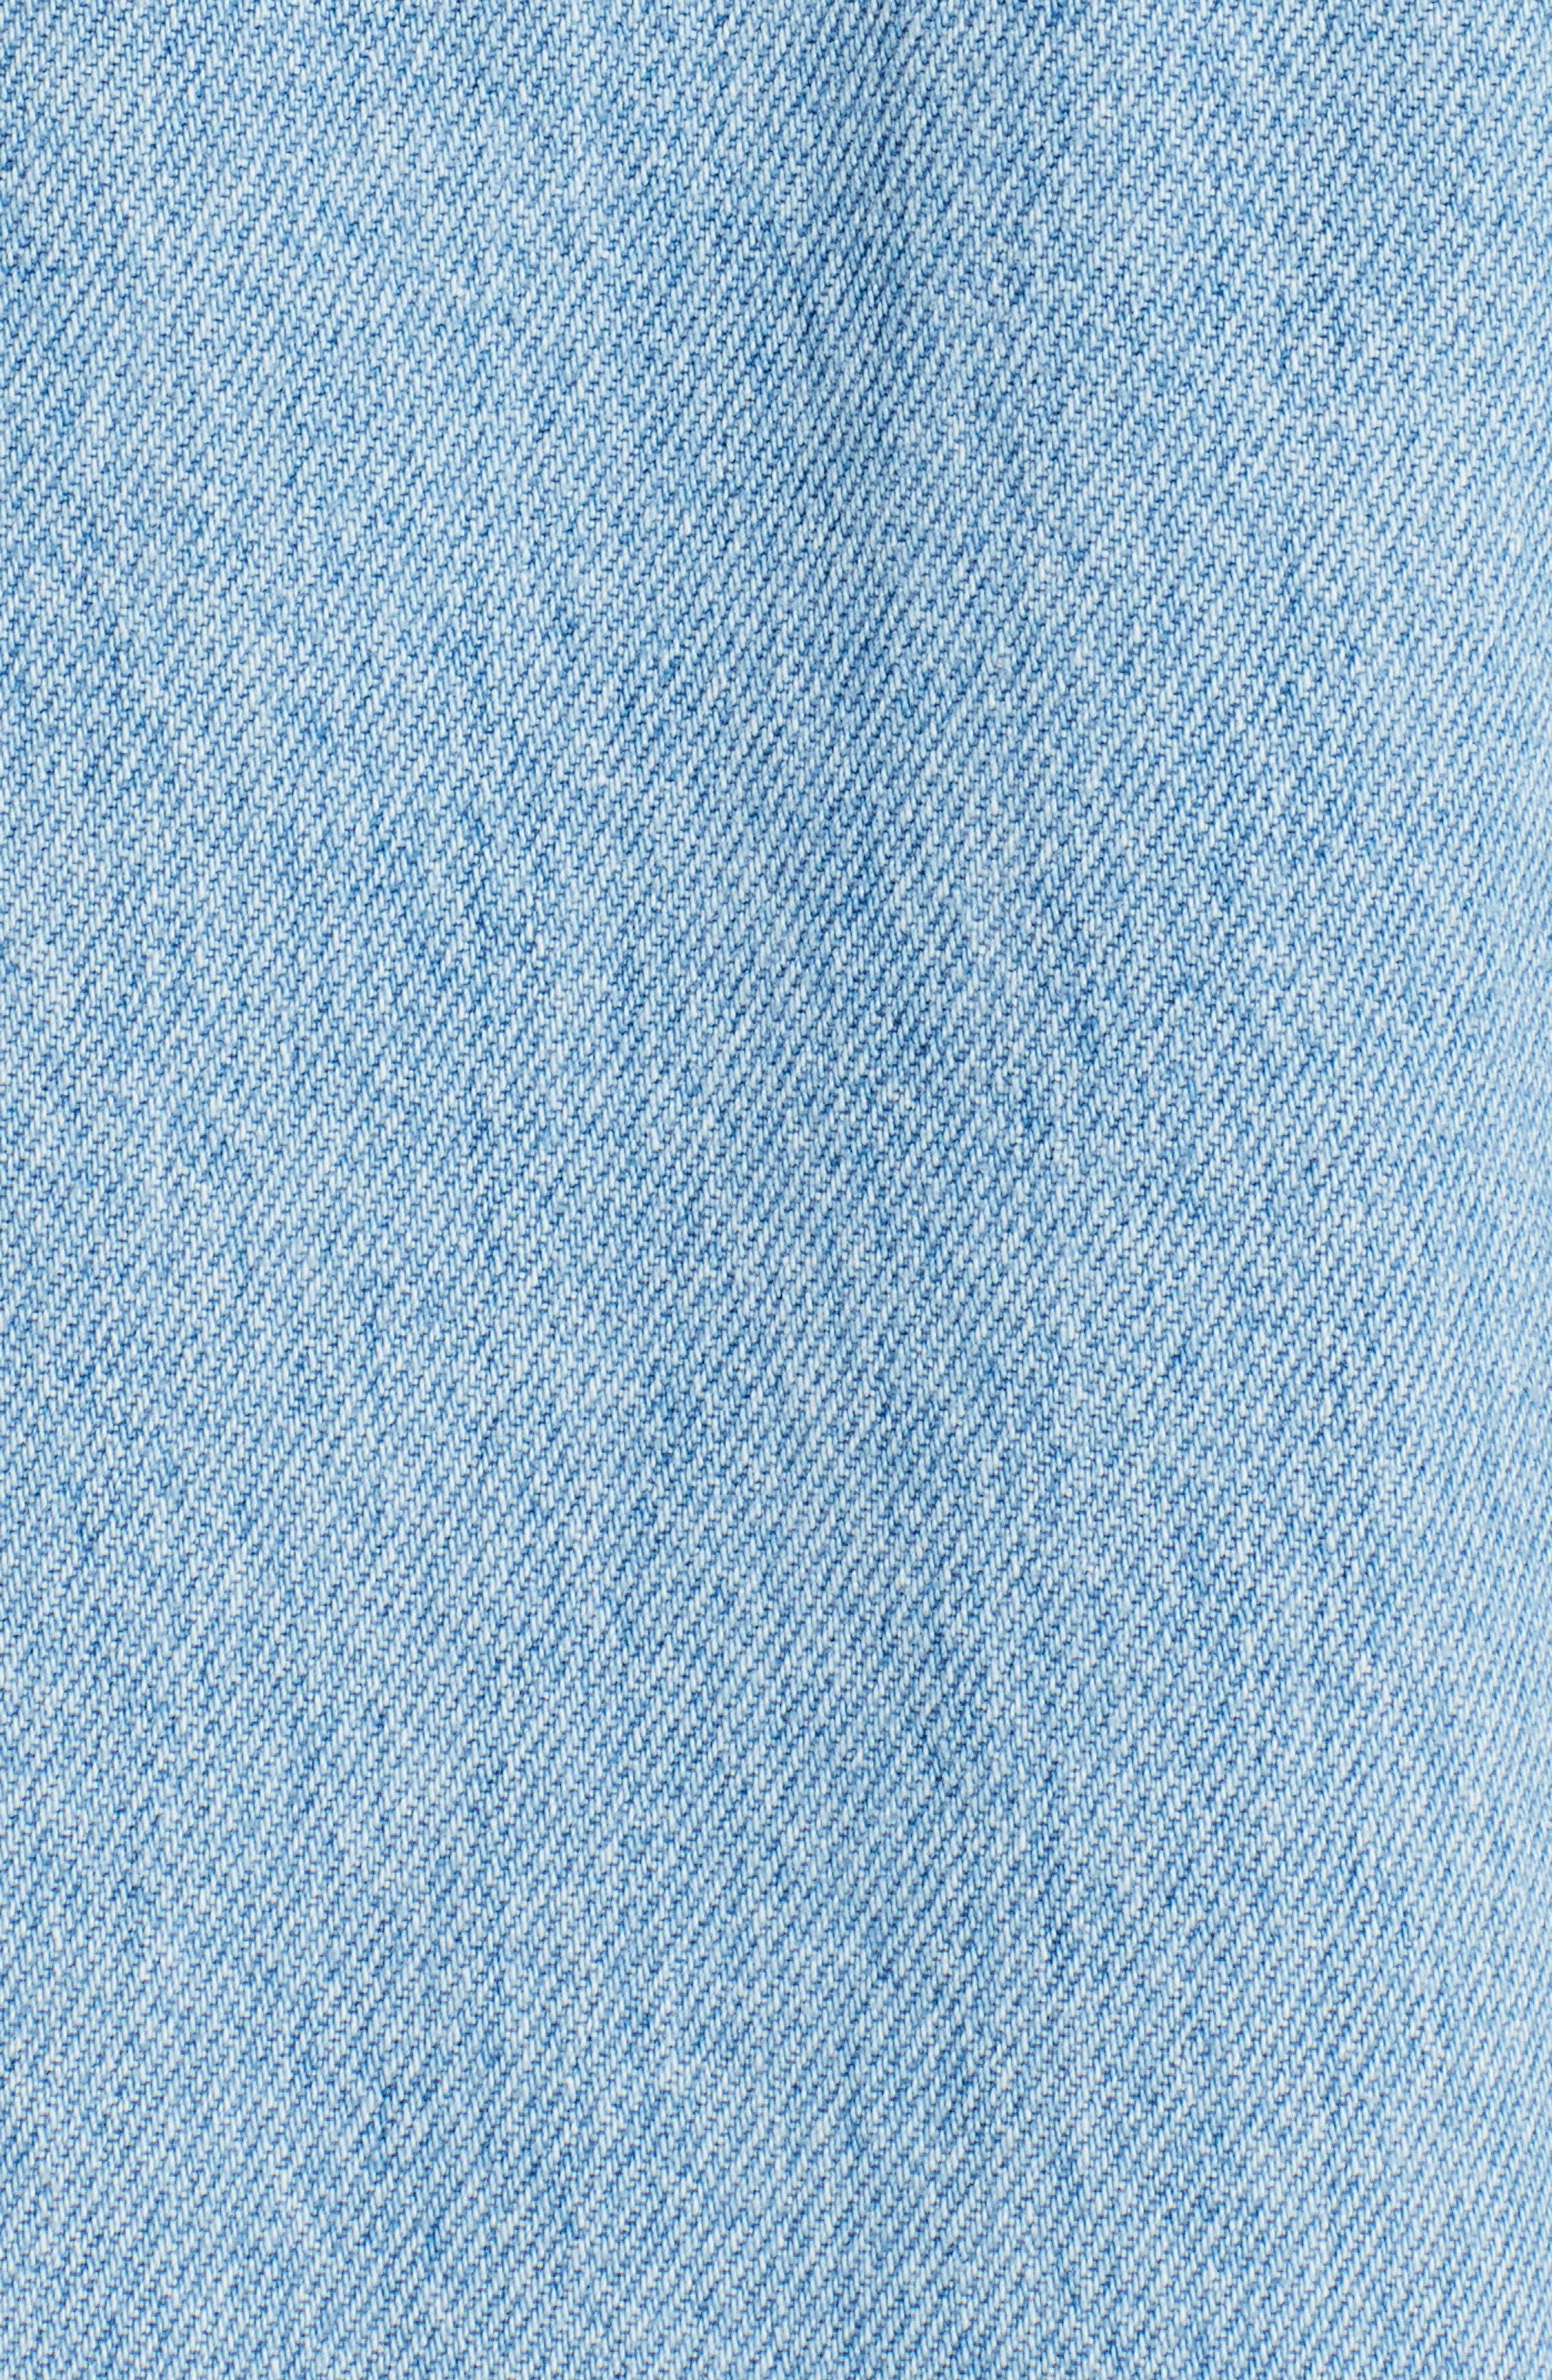 Zip Front Denim Jacket,                             Alternate thumbnail 5, color,                             482